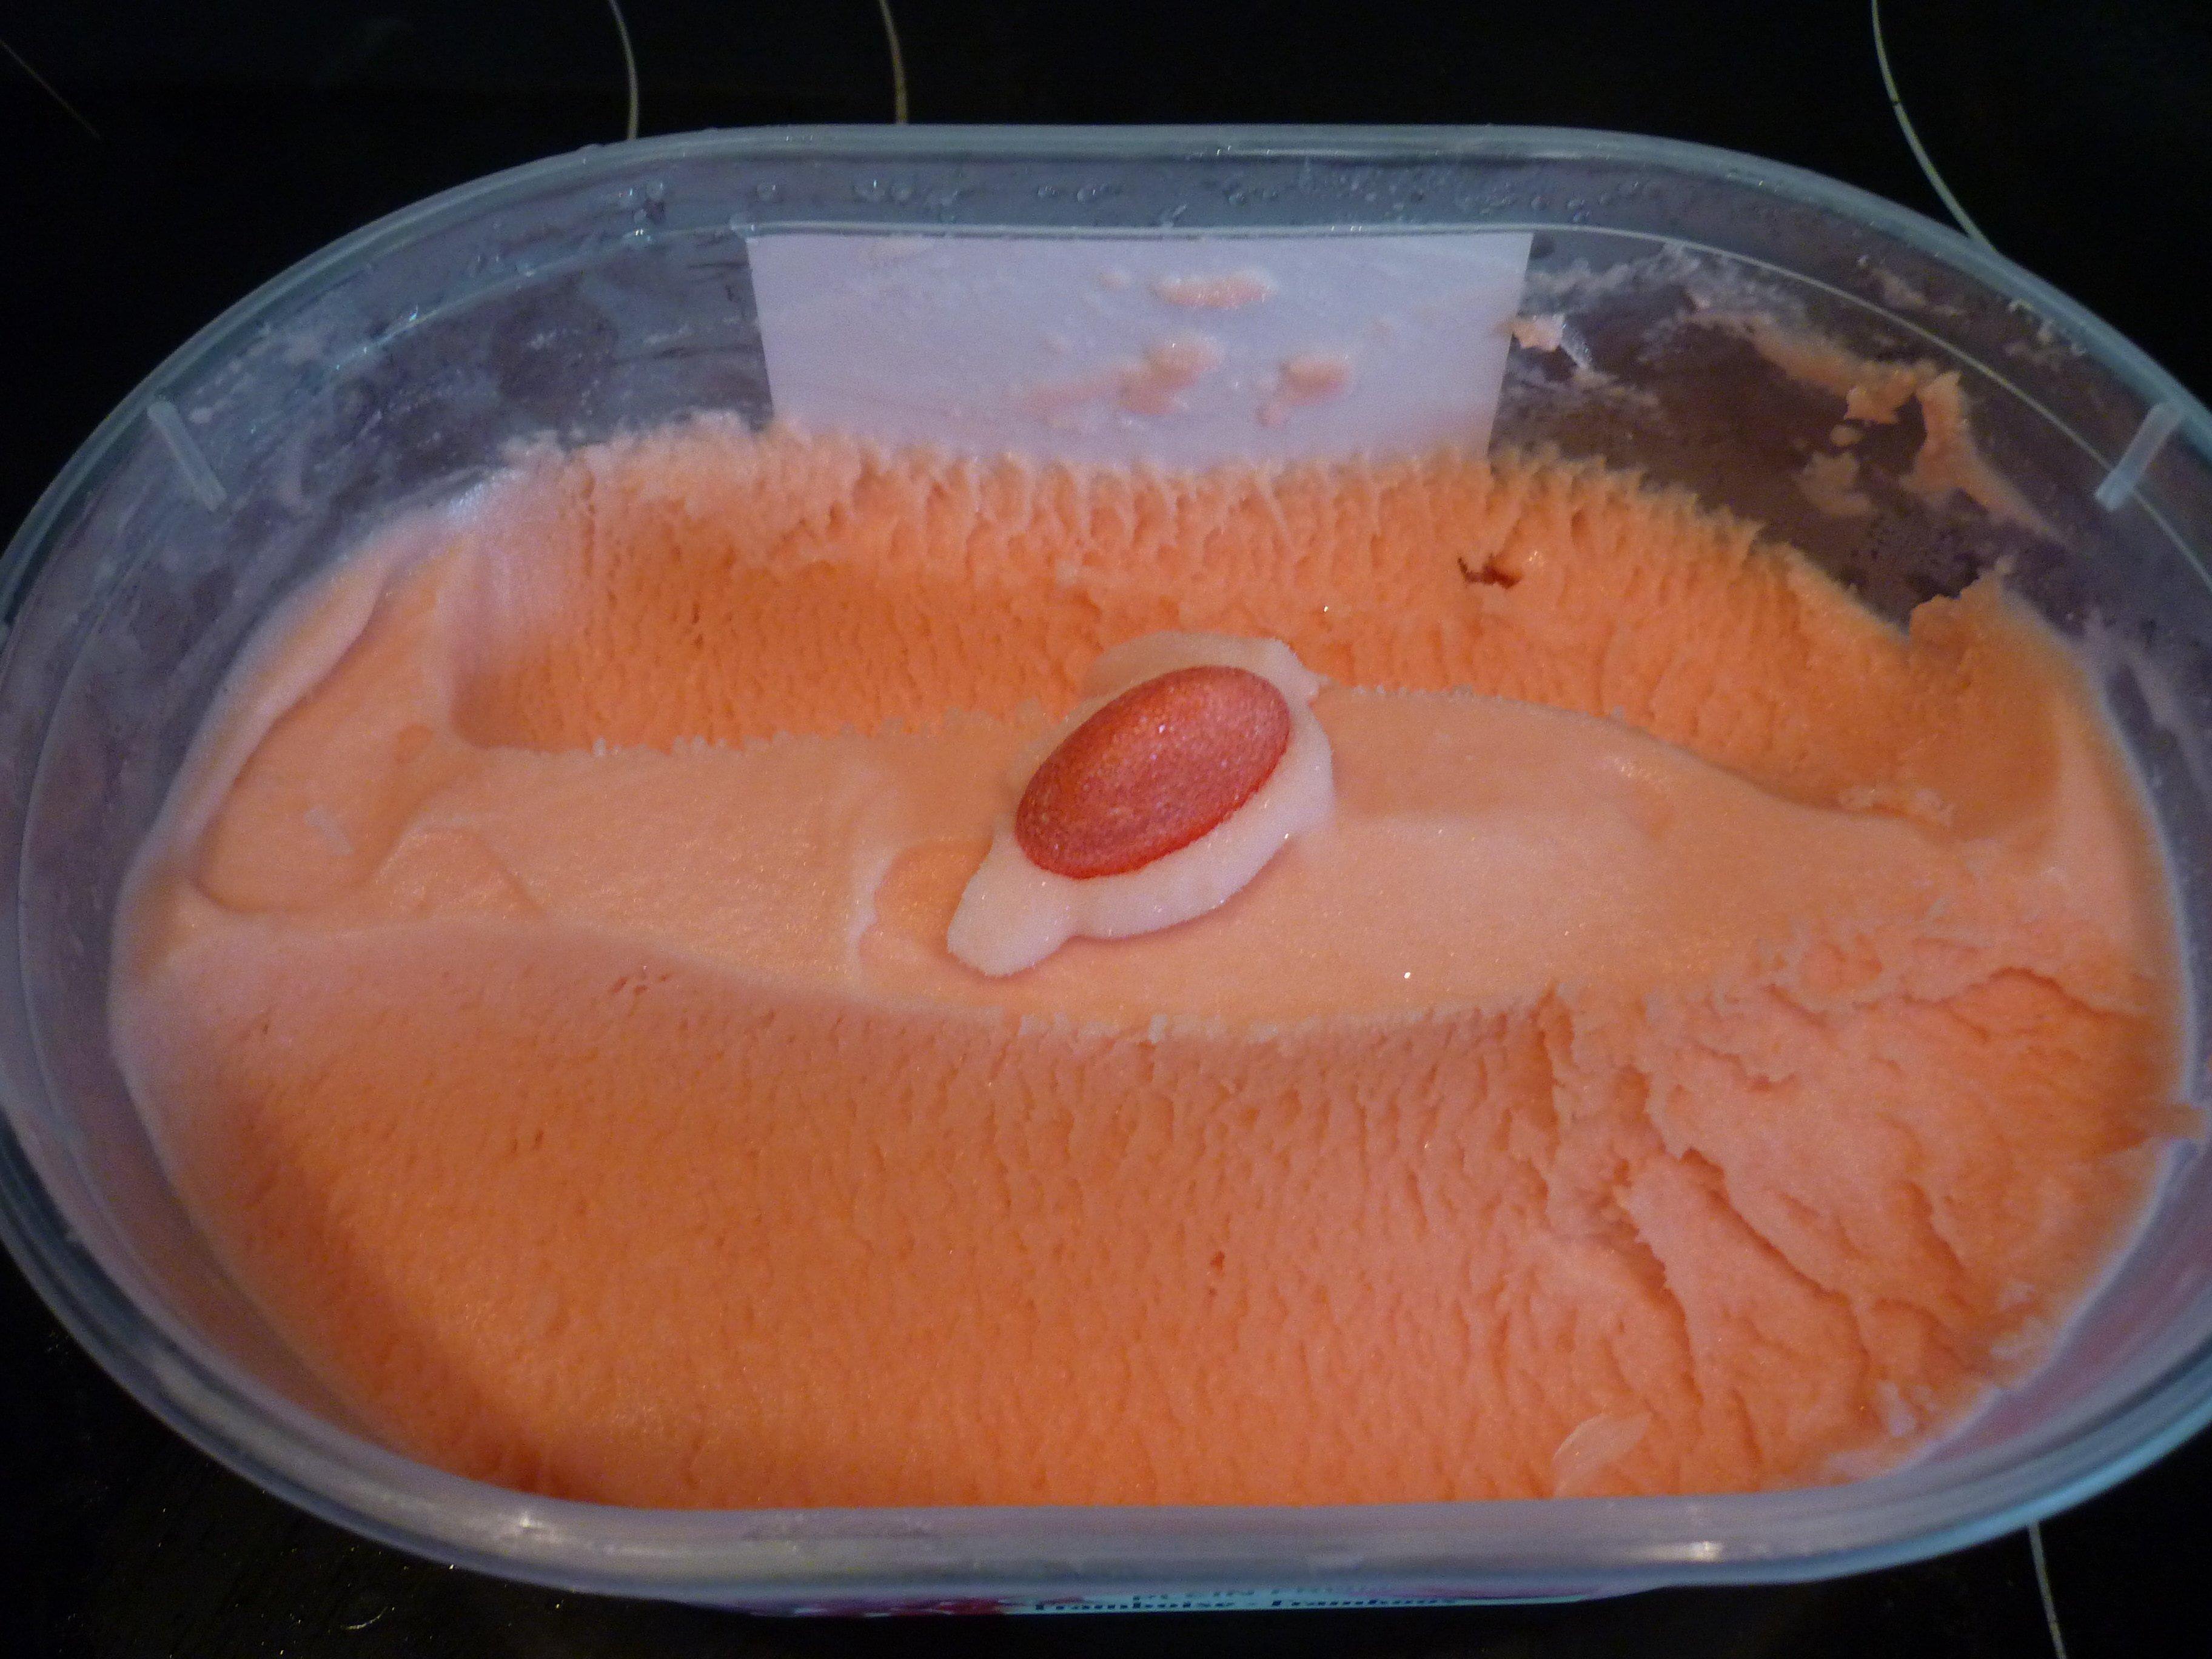 bonbon fraise T.g.d.